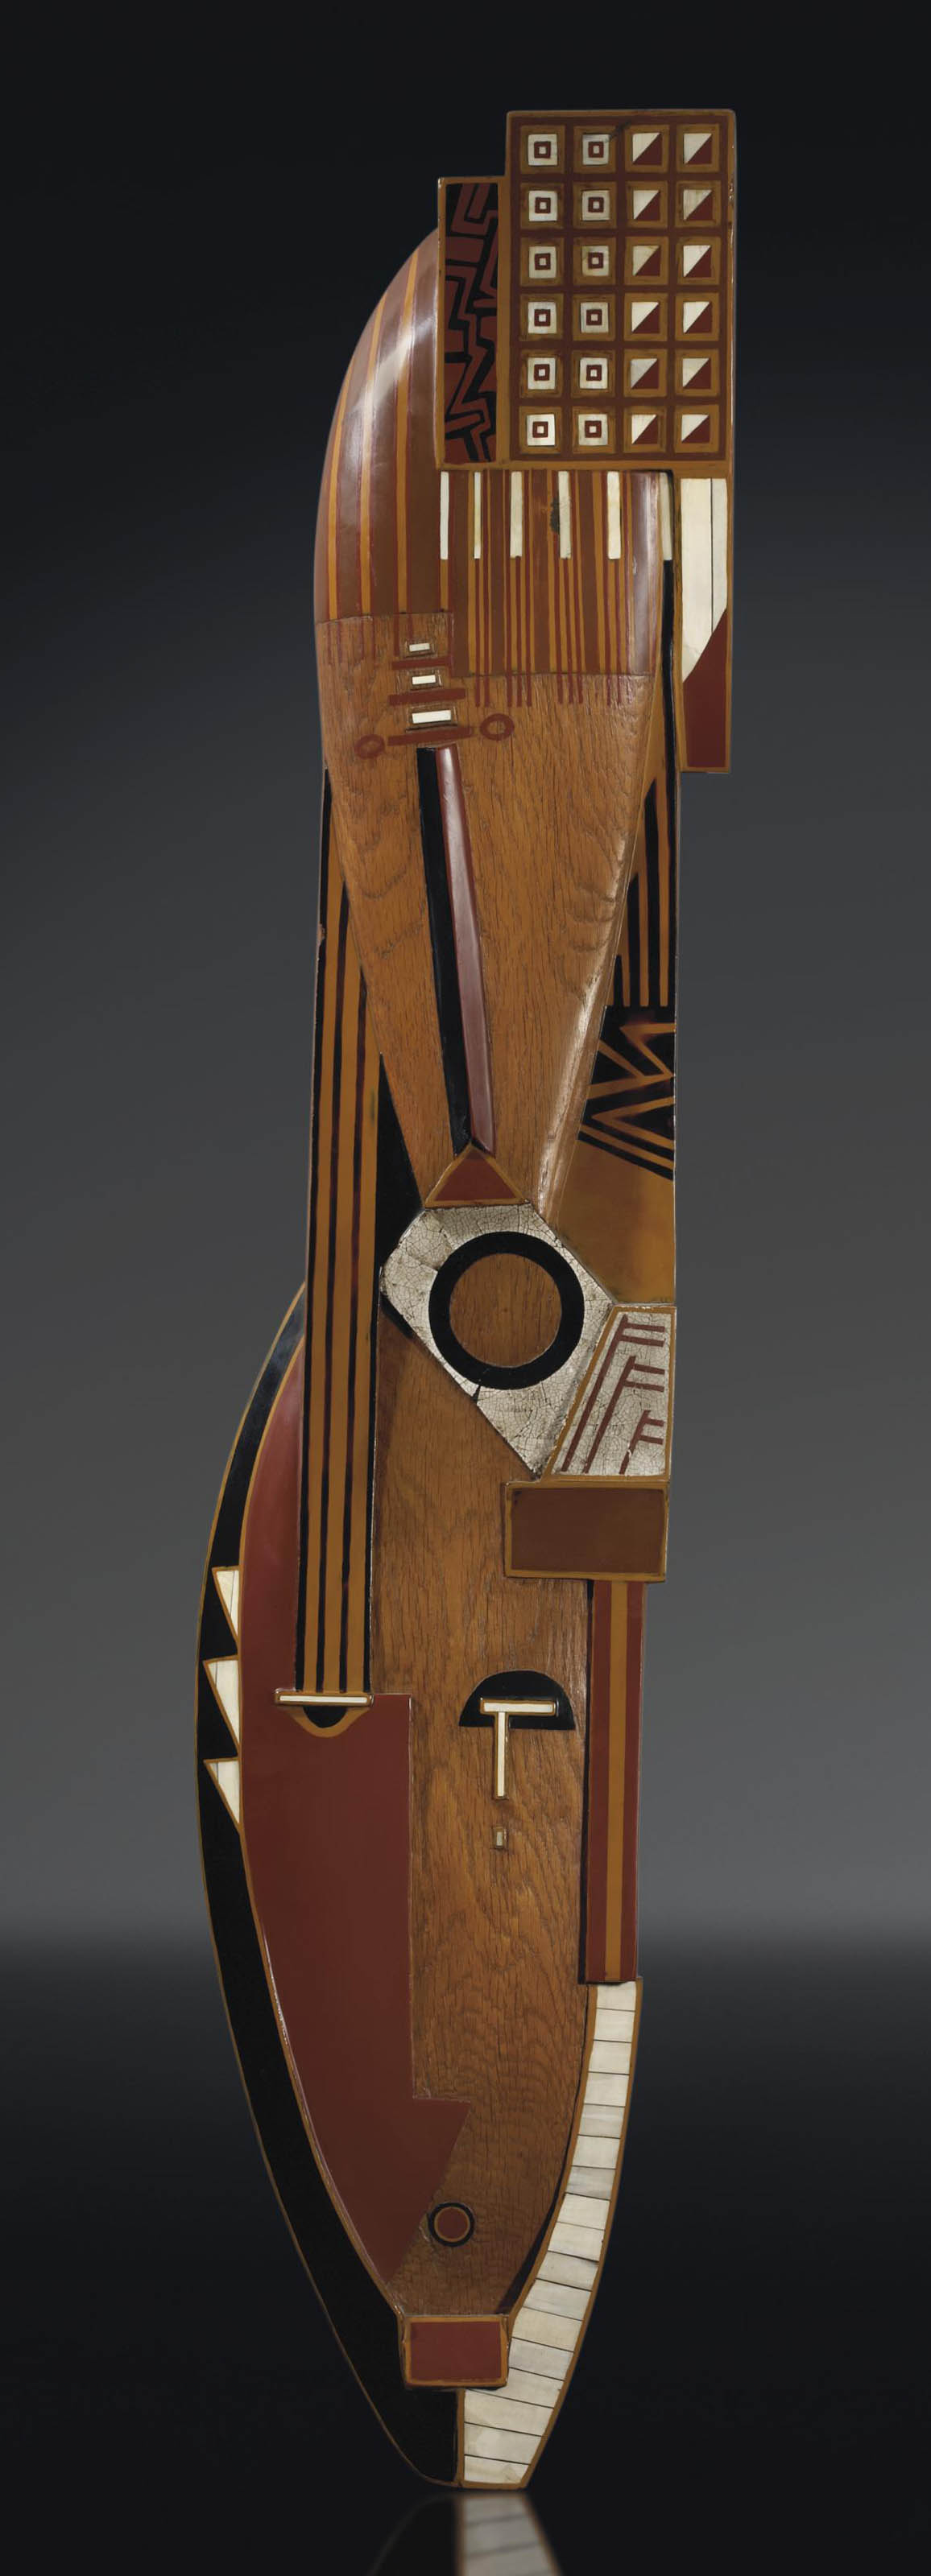 JEAN LAMBERT-RUCKI (1888-1967) ET JEAN DUNAND (1877-1942)